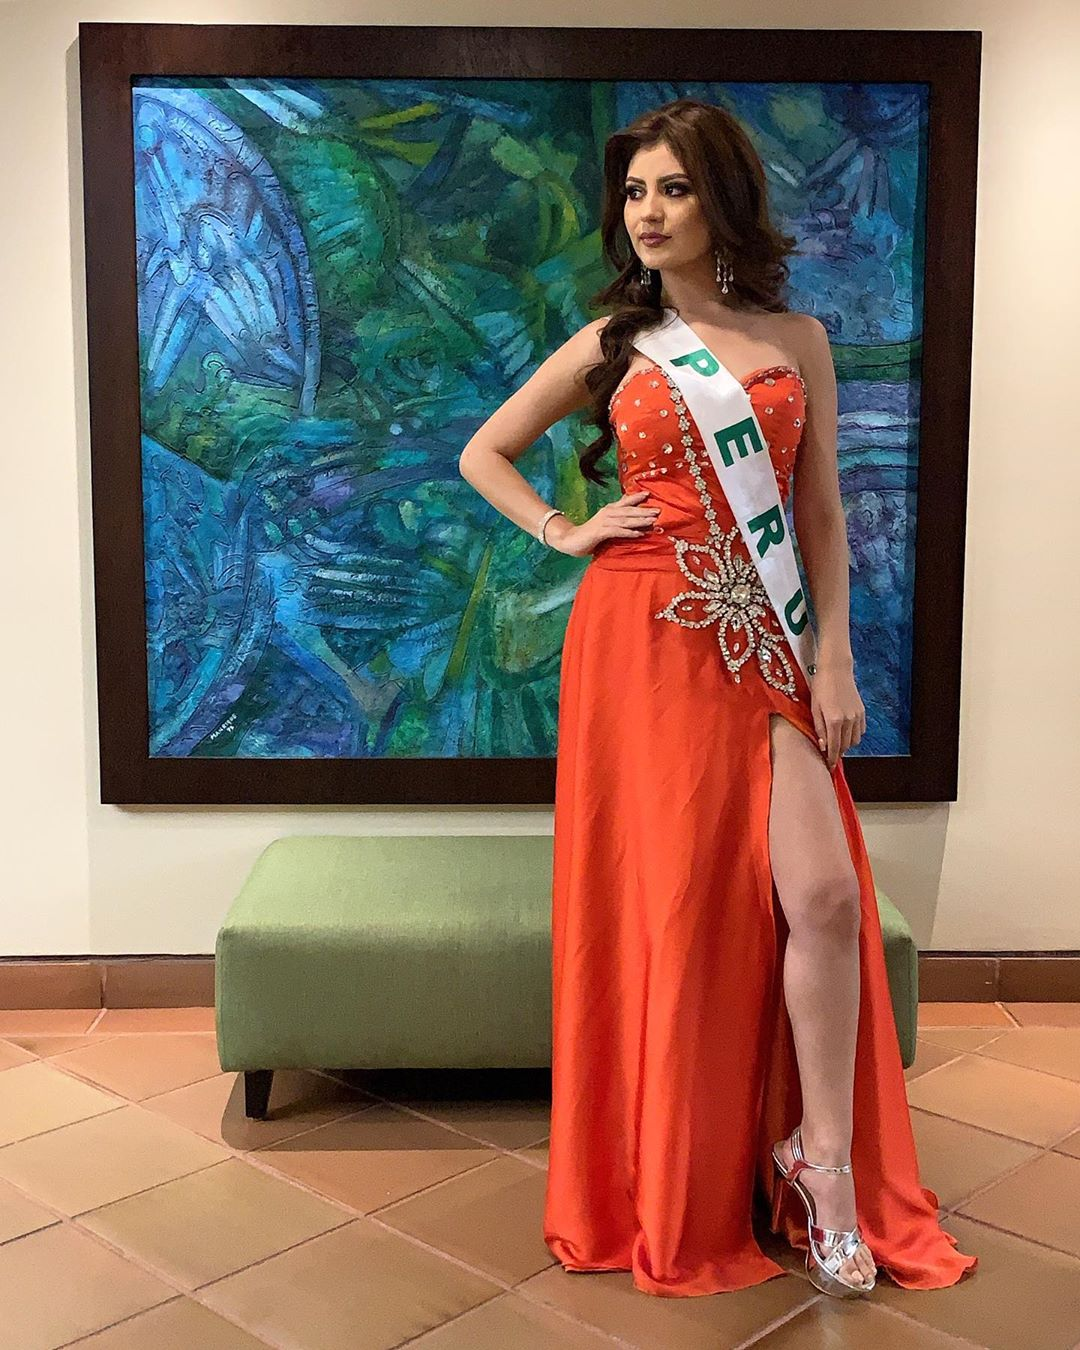 alexandra pinillos, 3ra finalista de reyna mundial banano 2019. - Página 3 70250310